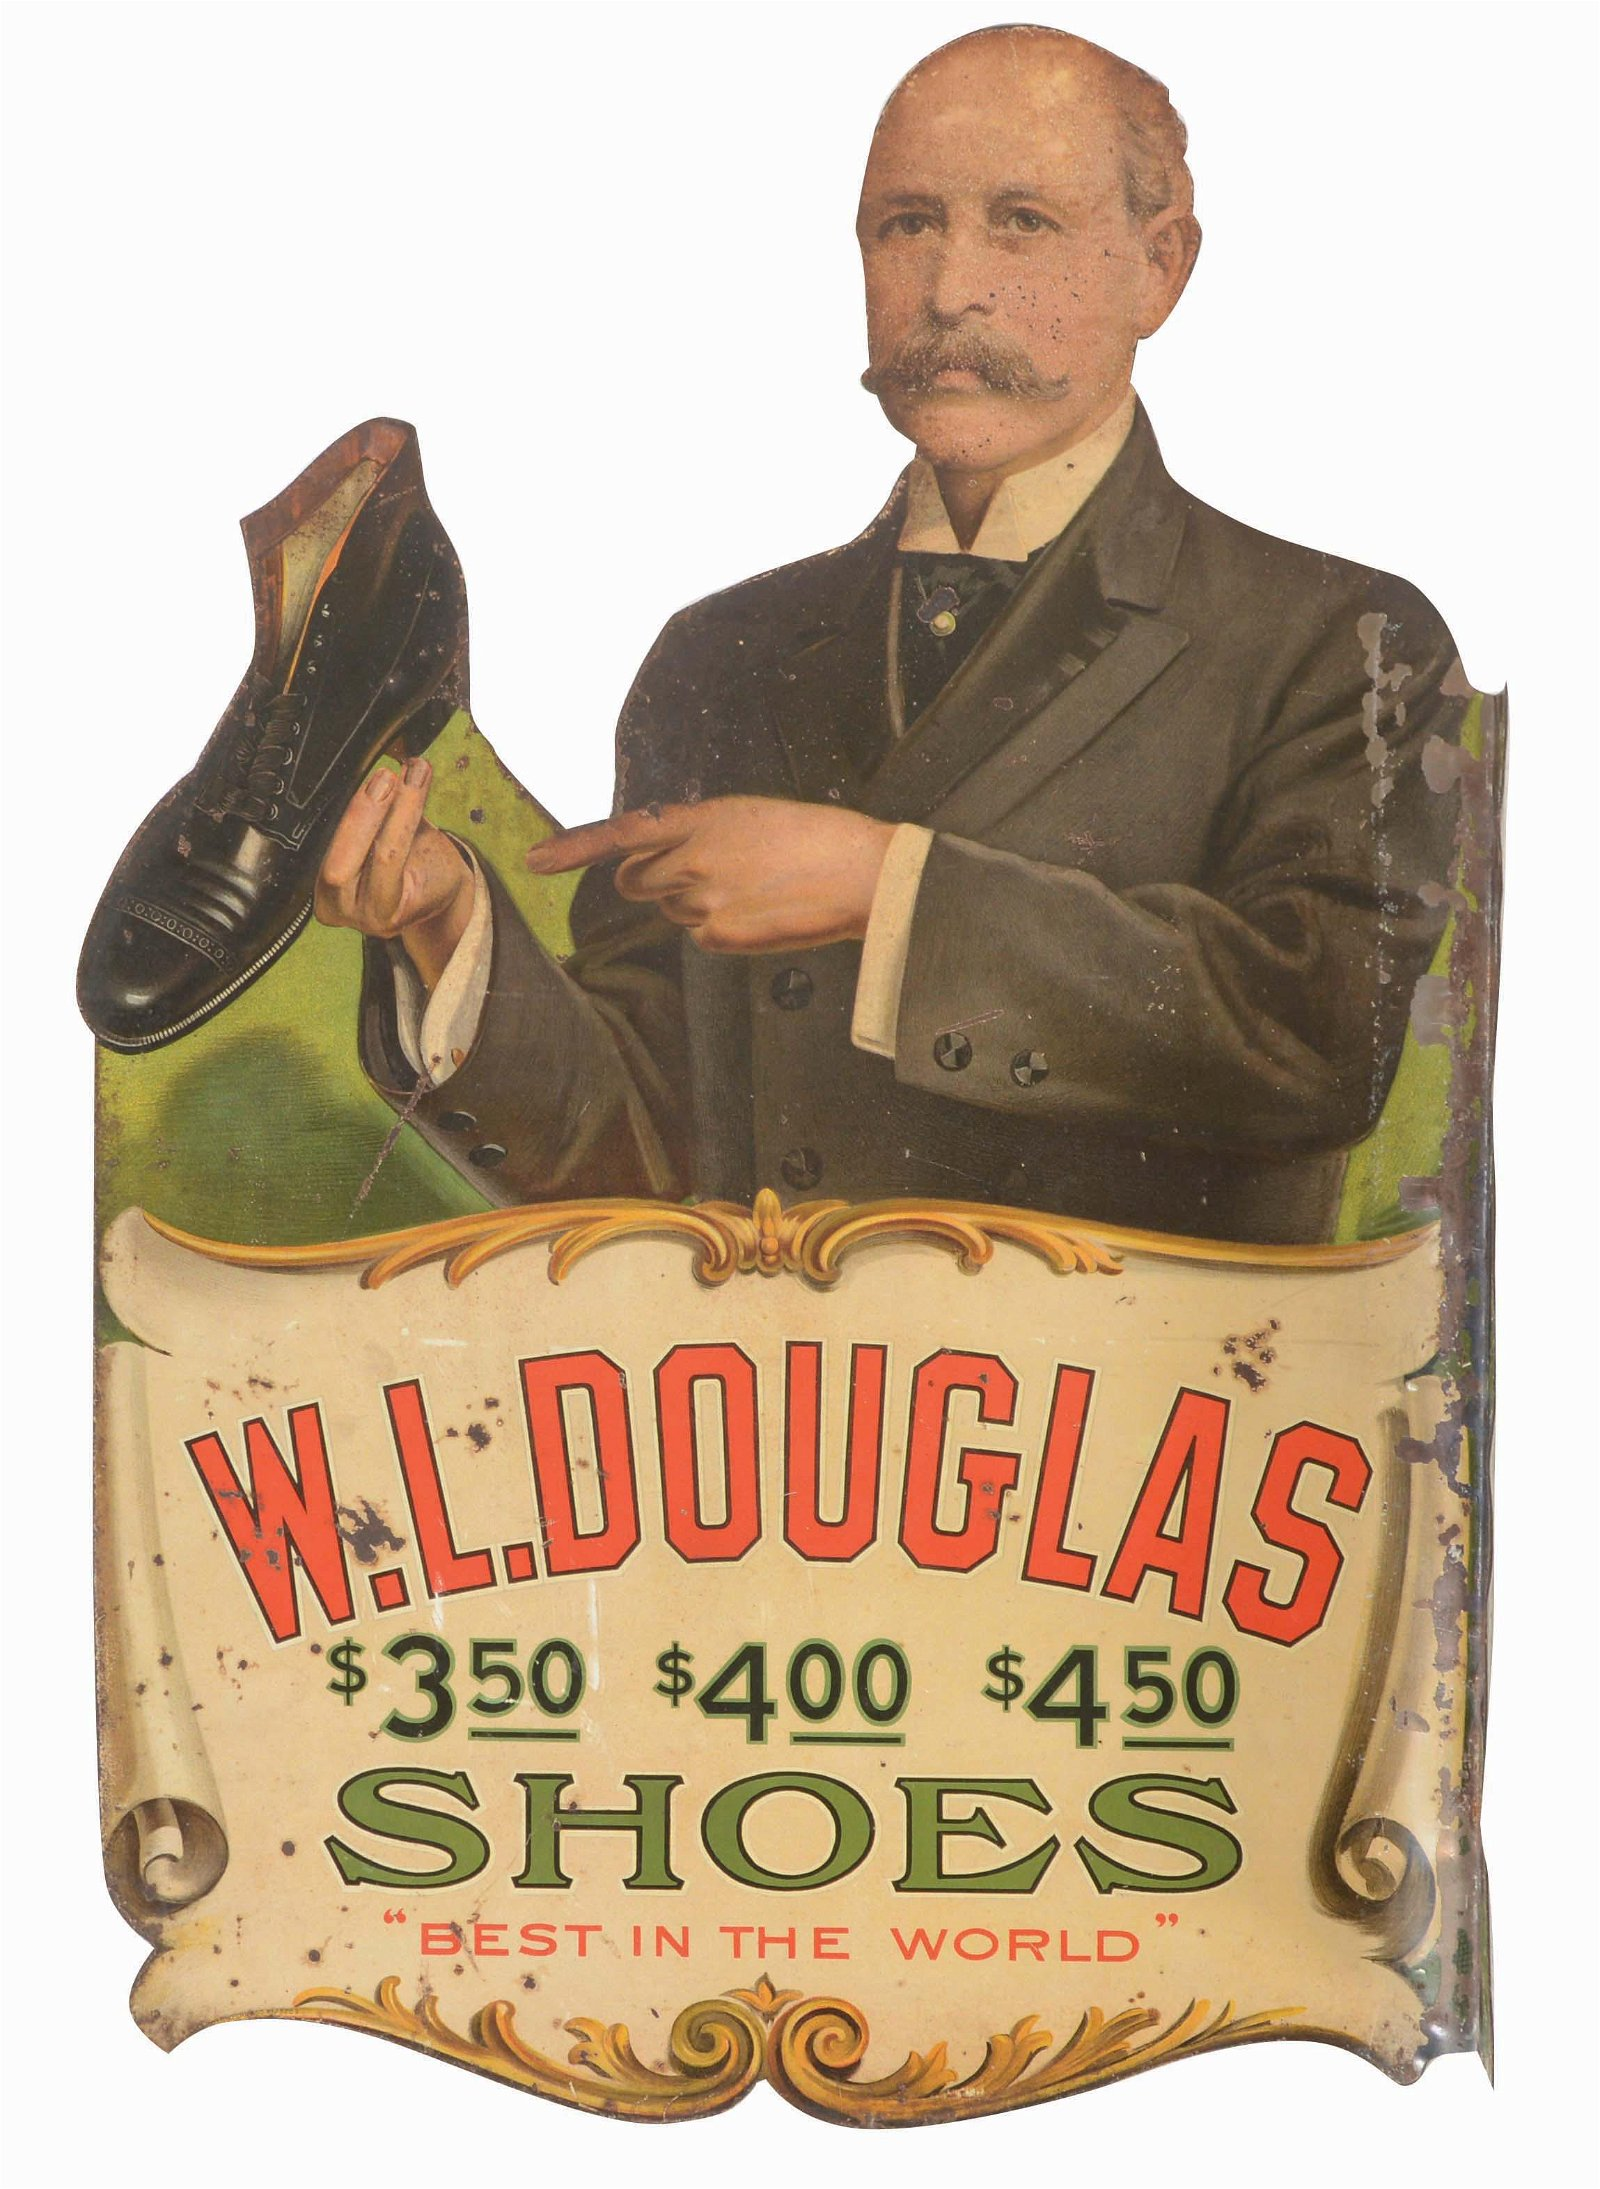 W.L. DOUGLAS SHOES DOUBLE SIDED SIGN.